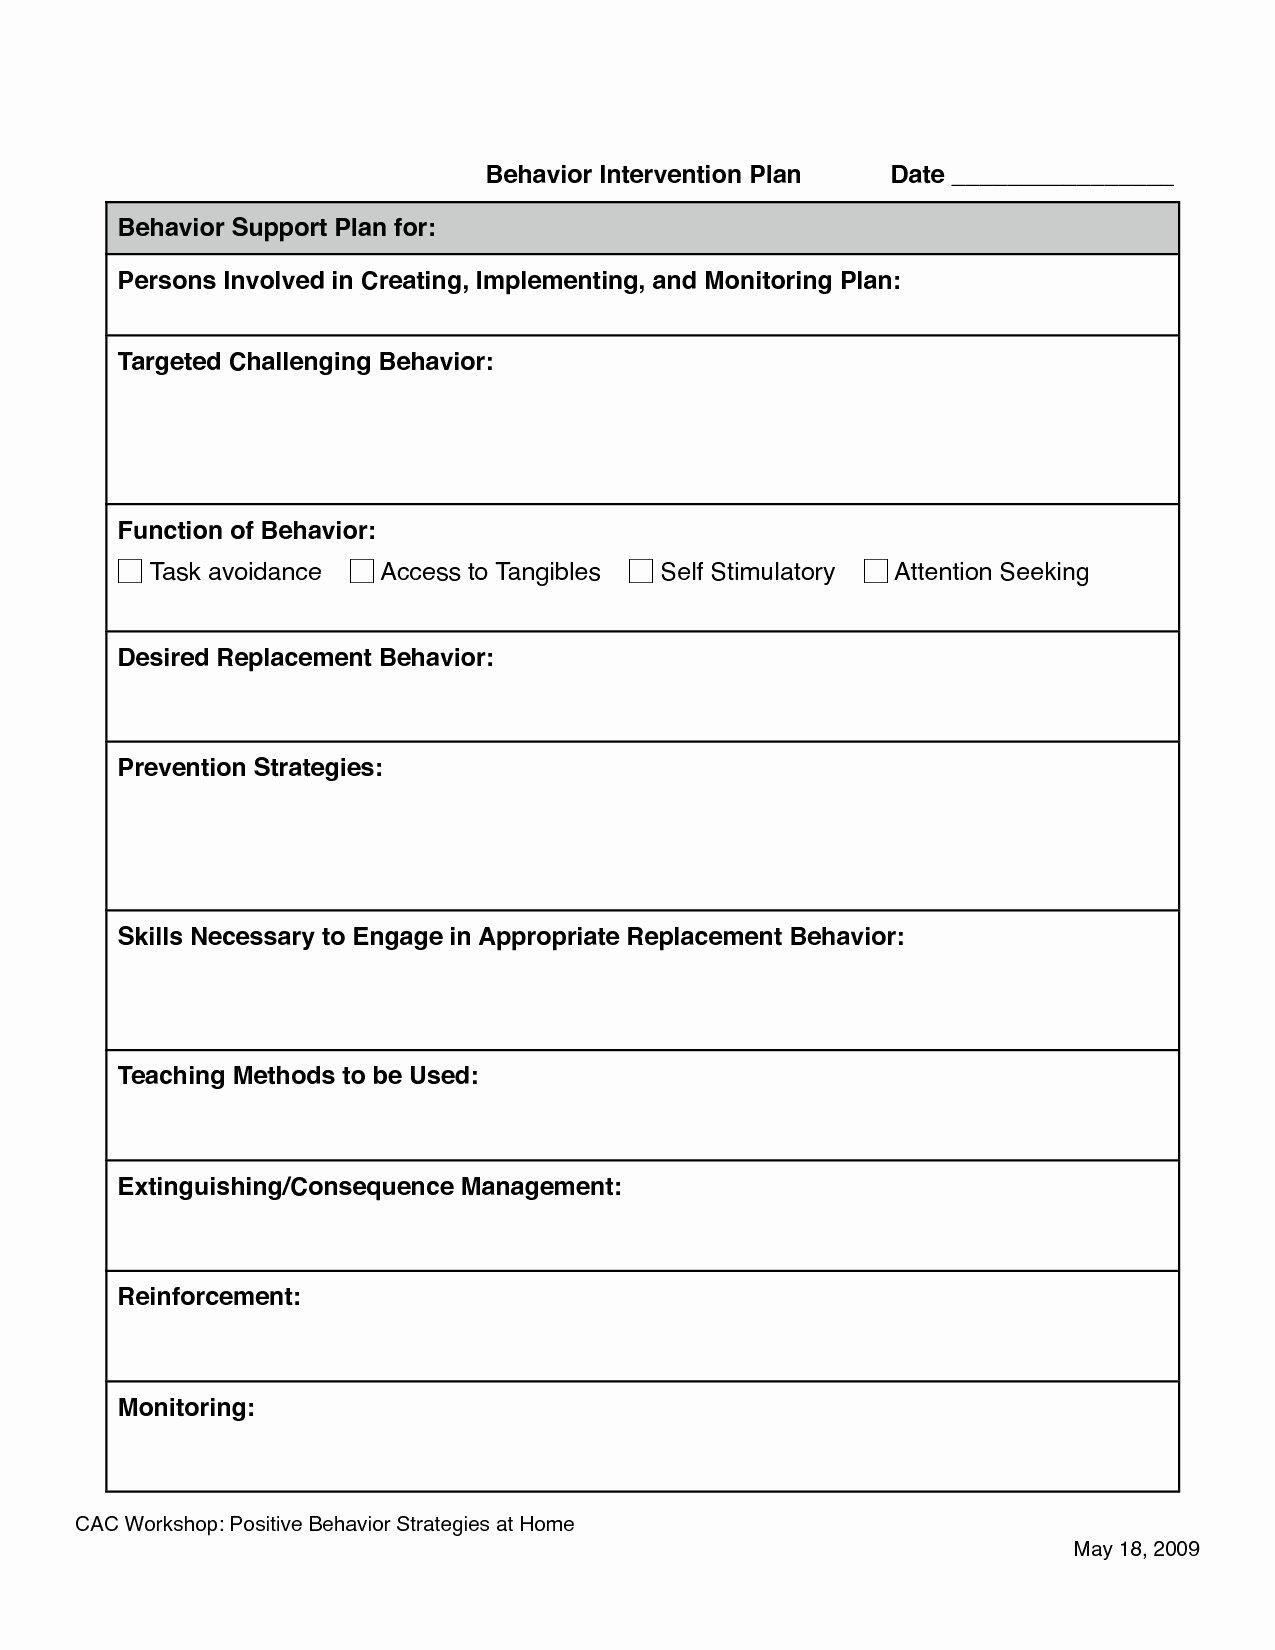 Behavior Intervention Plan Template Doc Luxury Behavior Intervention Plan Template Doc